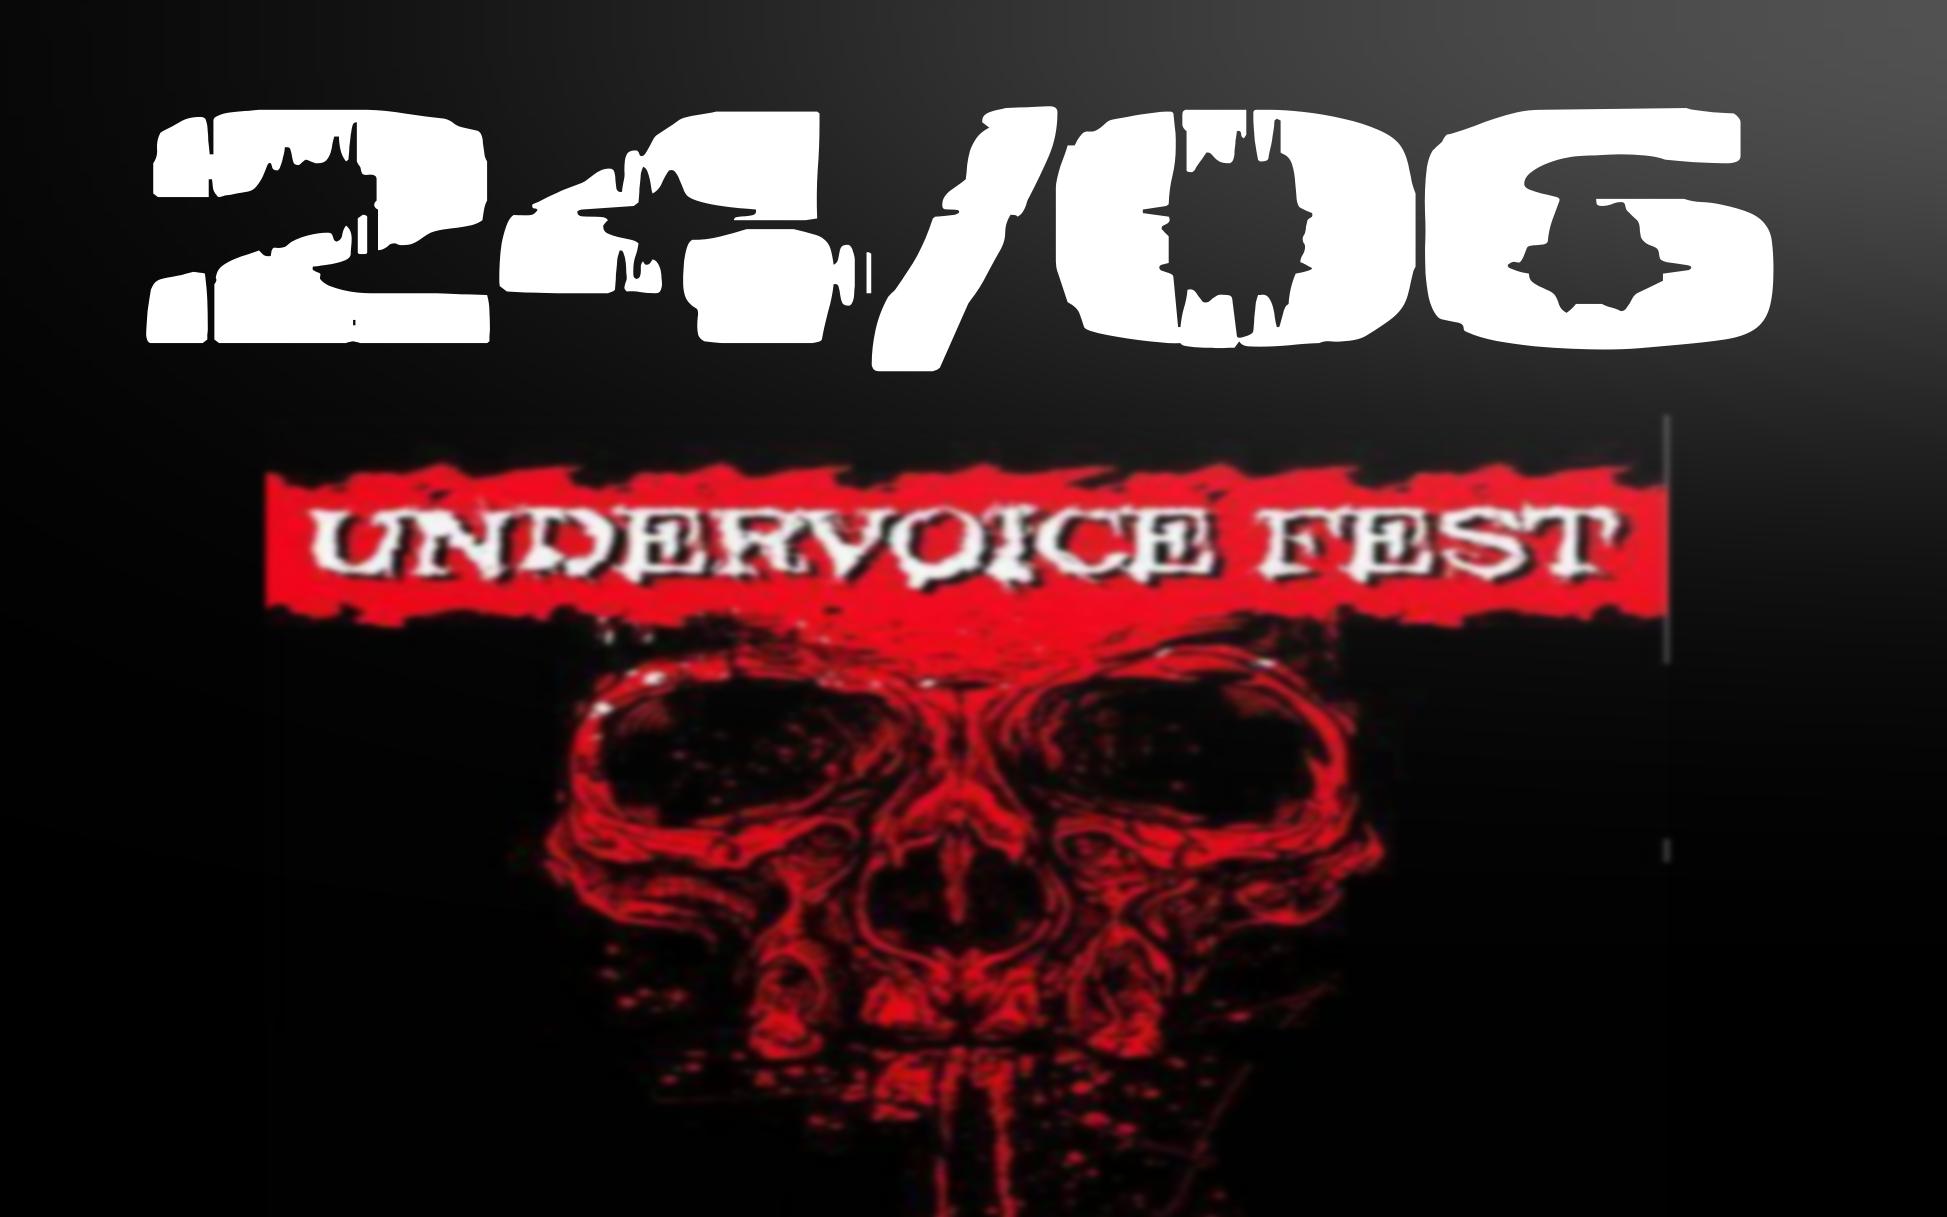 EVENTO: Undervoice Fest